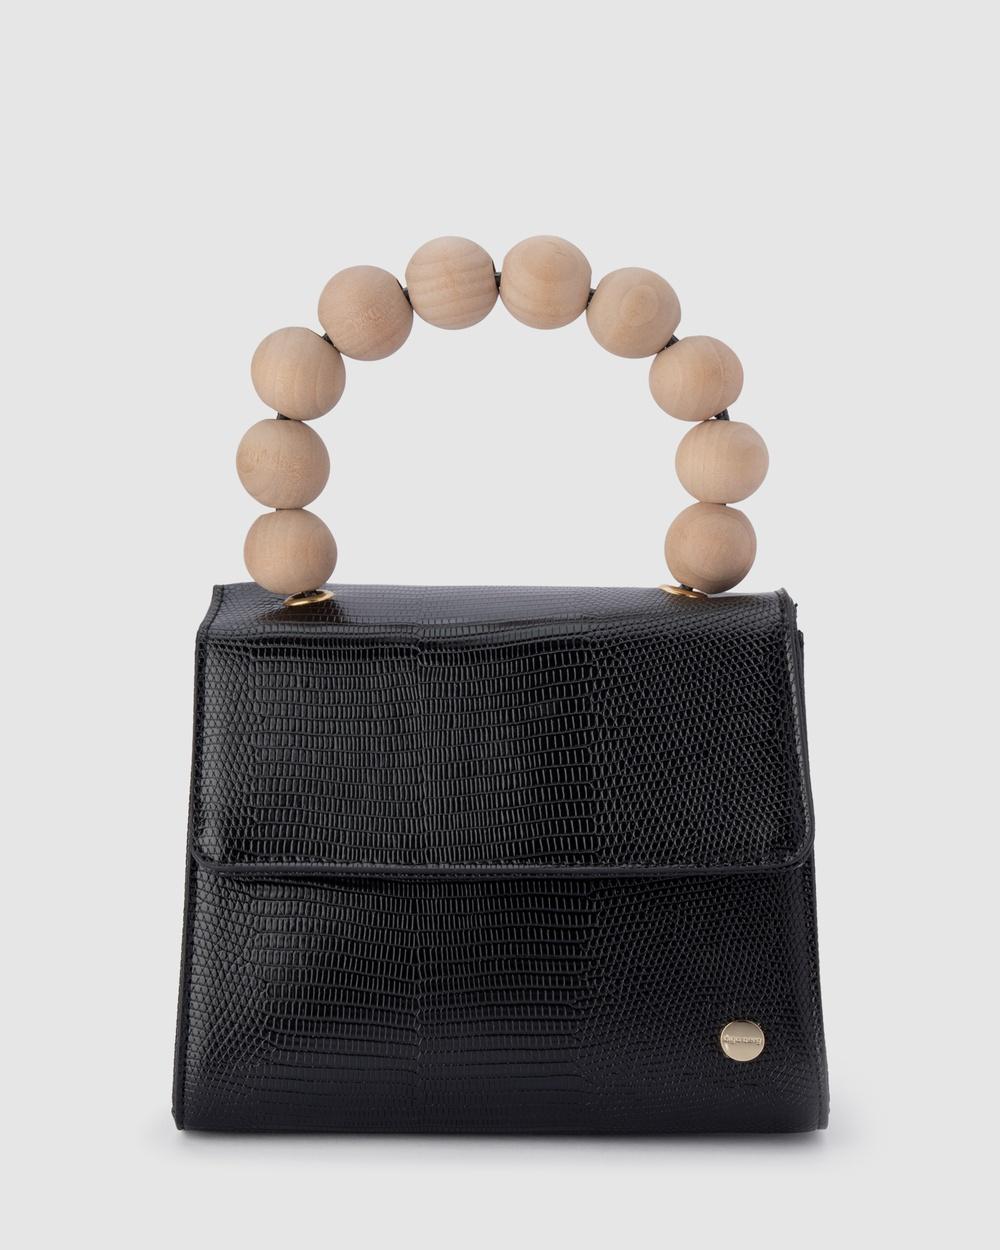 Olga Berg Caylee Wood Bead Handle Bag Handbags Black Handbags Australia